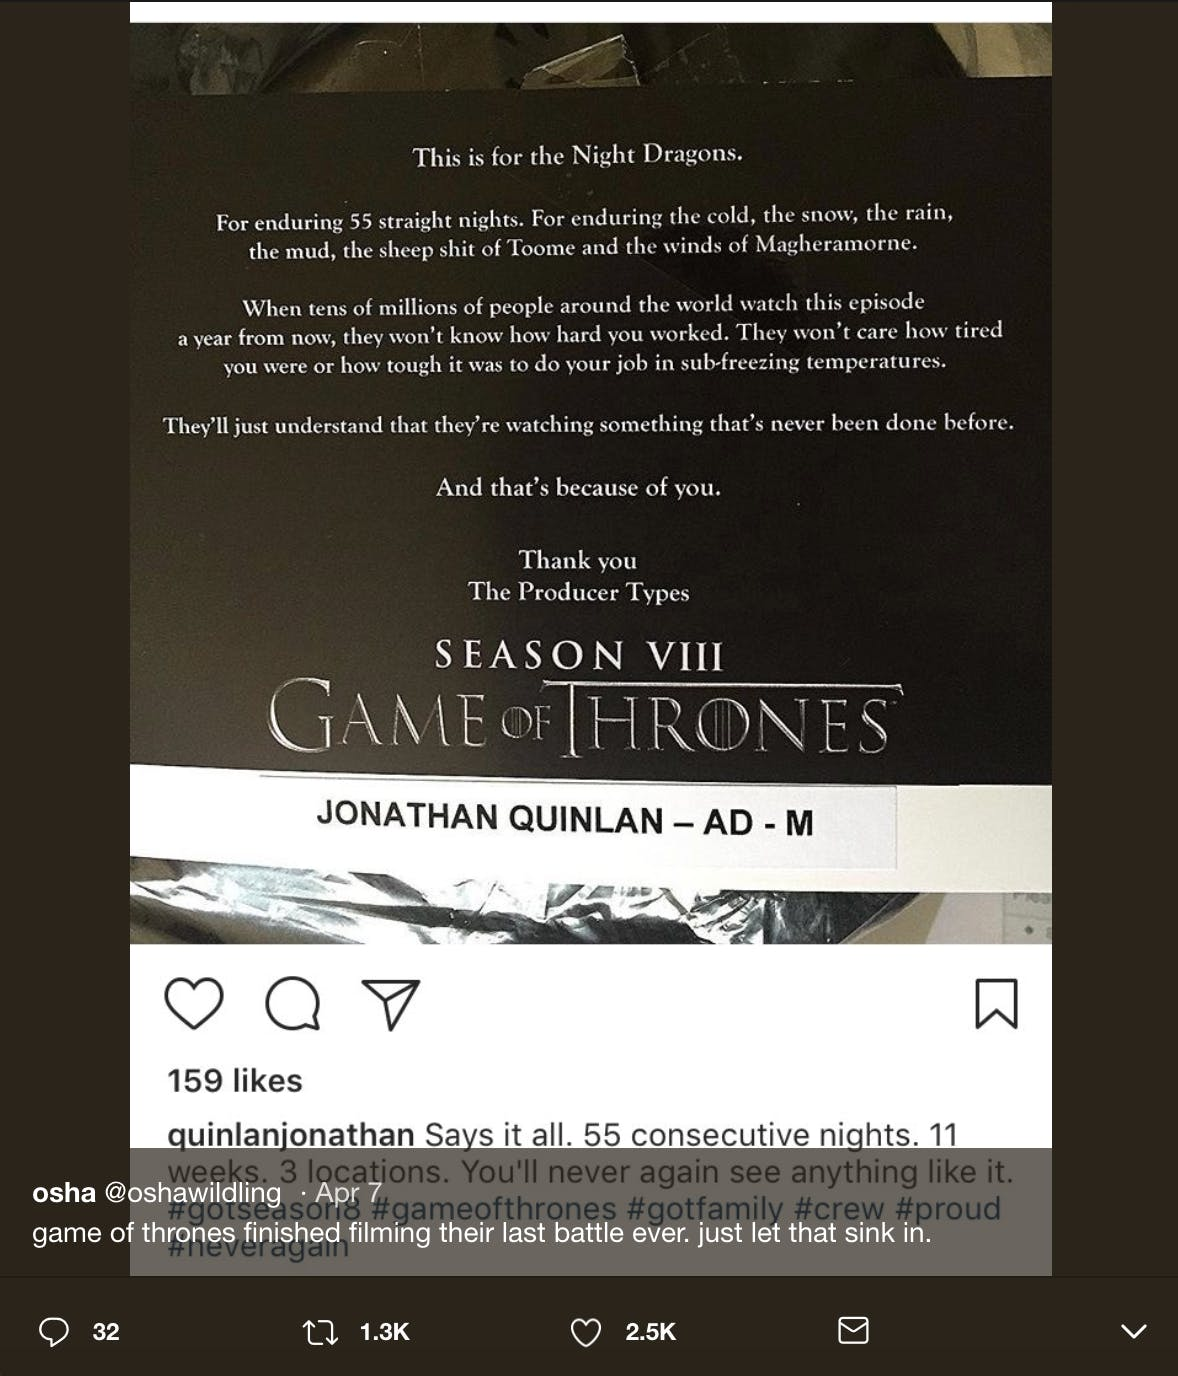 jonathan quinlan thrones shoot